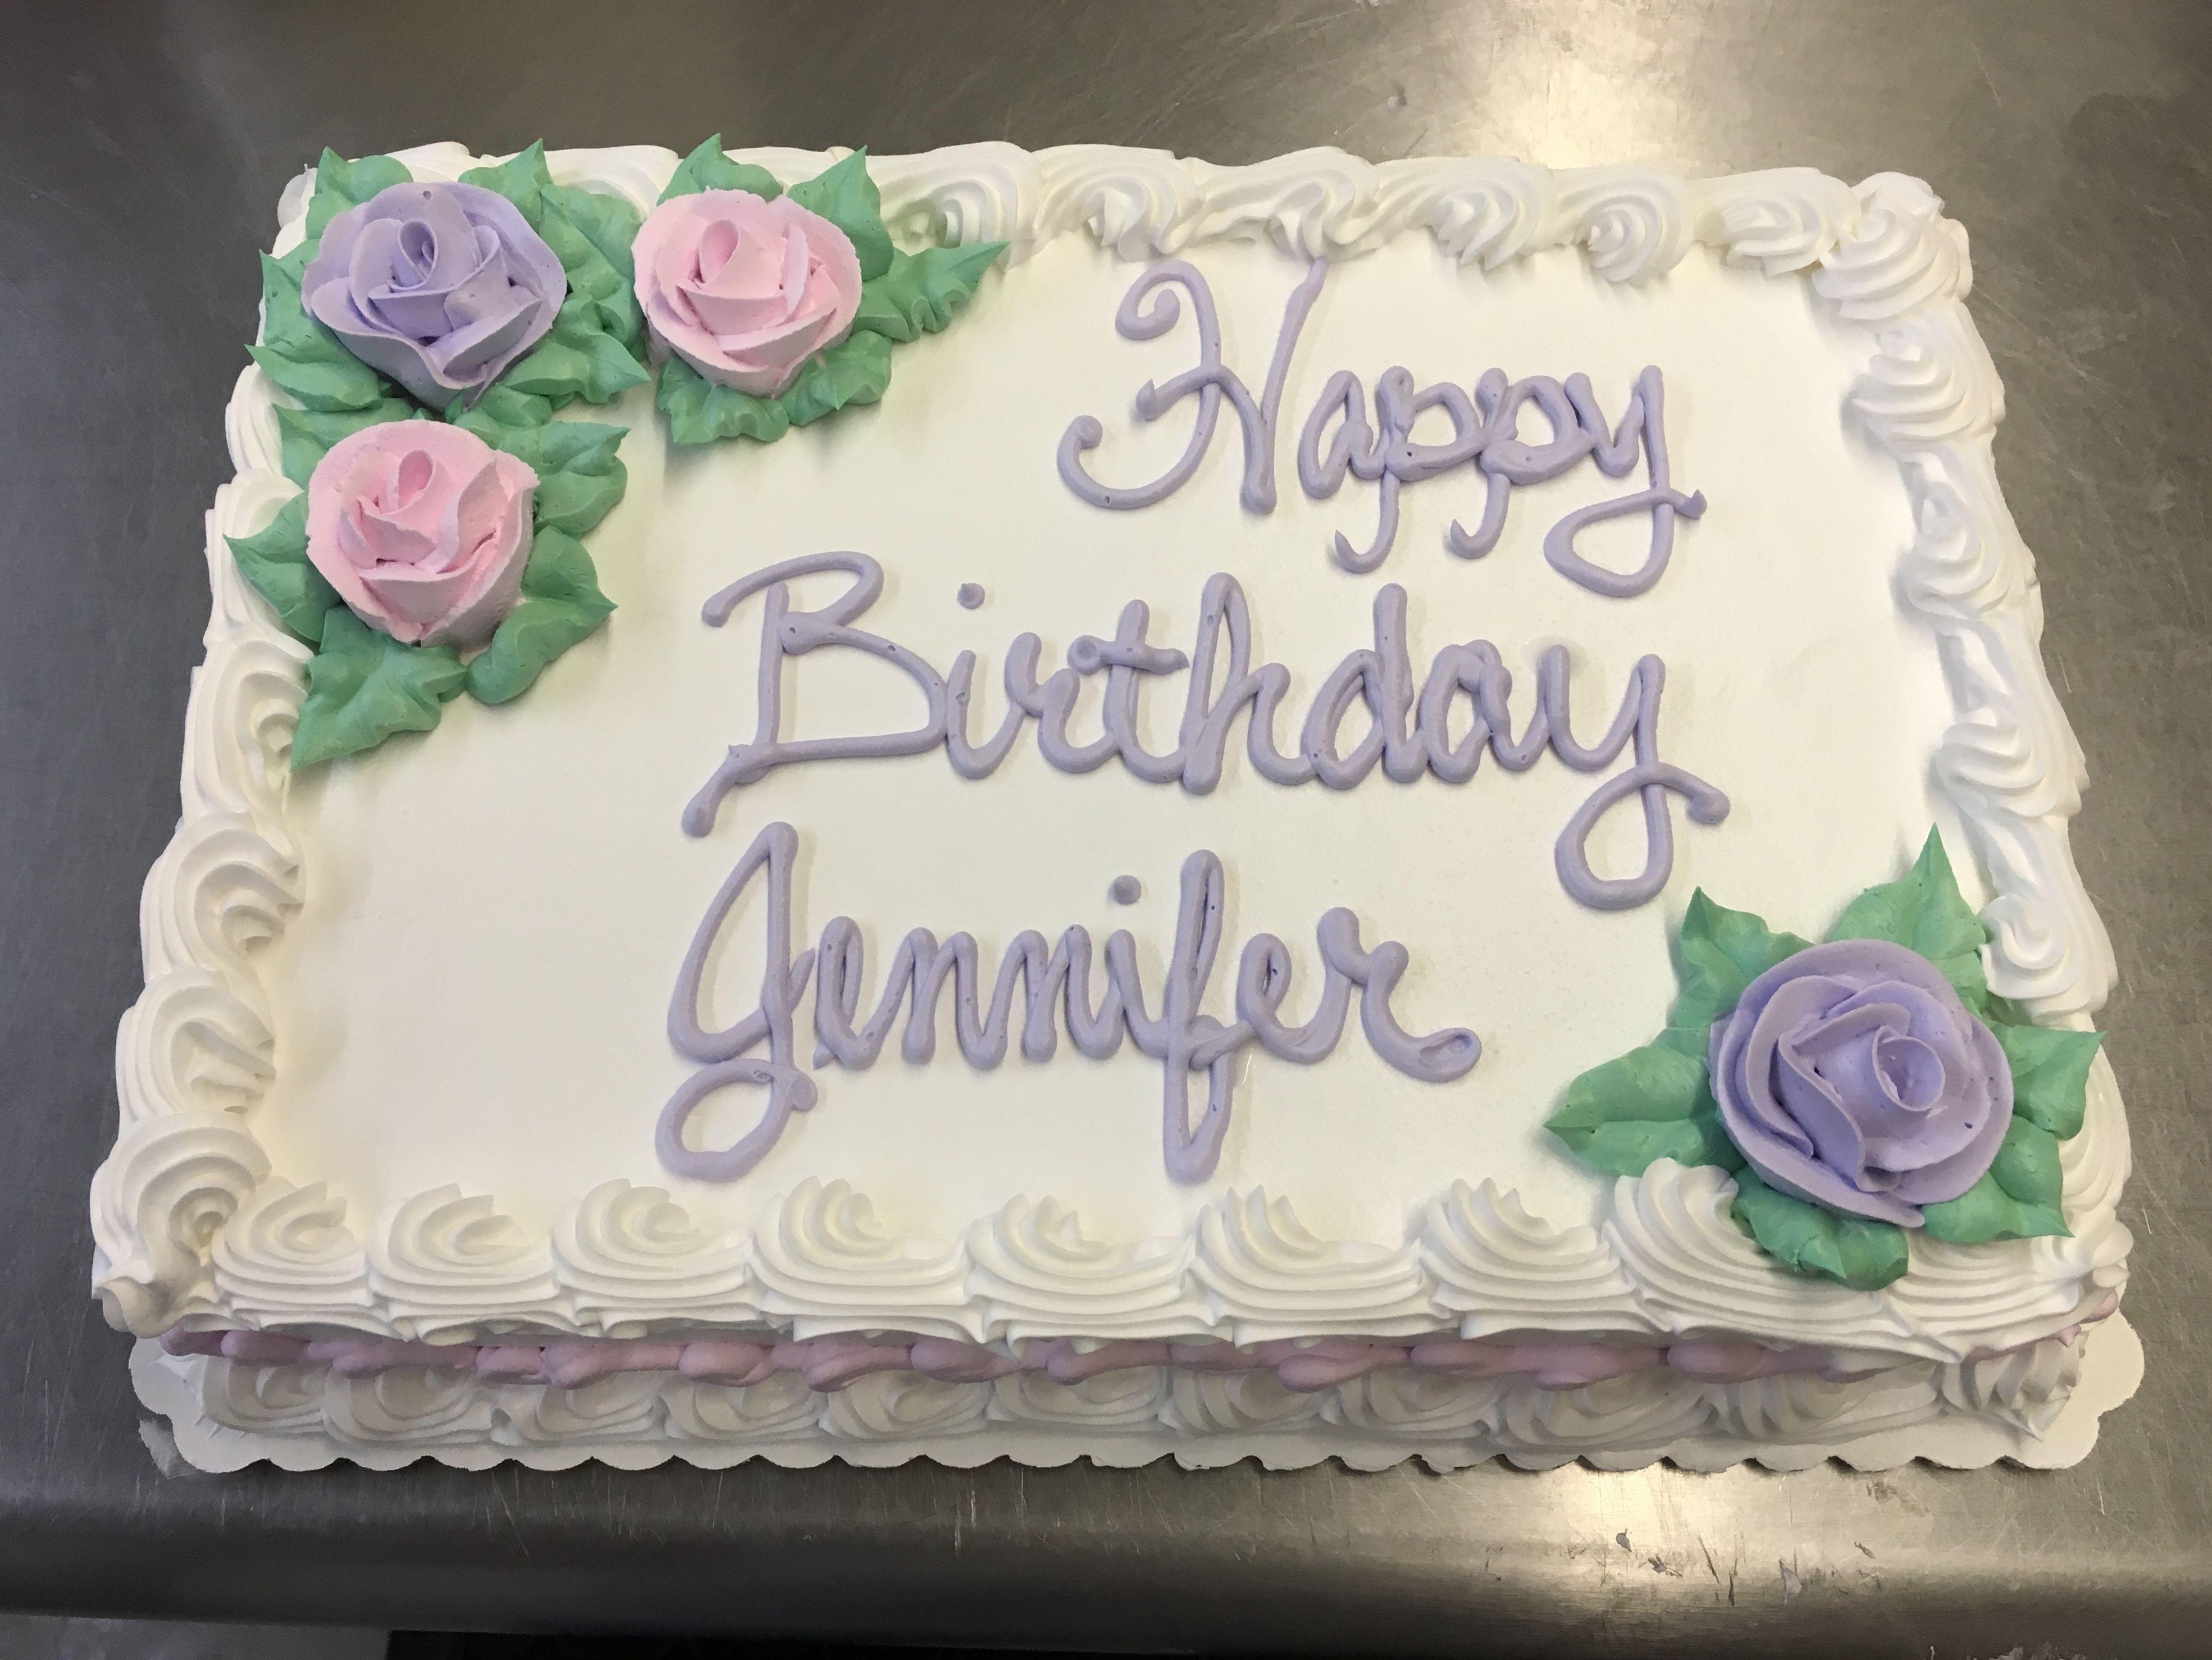 Birthday Cake sheet cake whipped icing roses Precious Memories